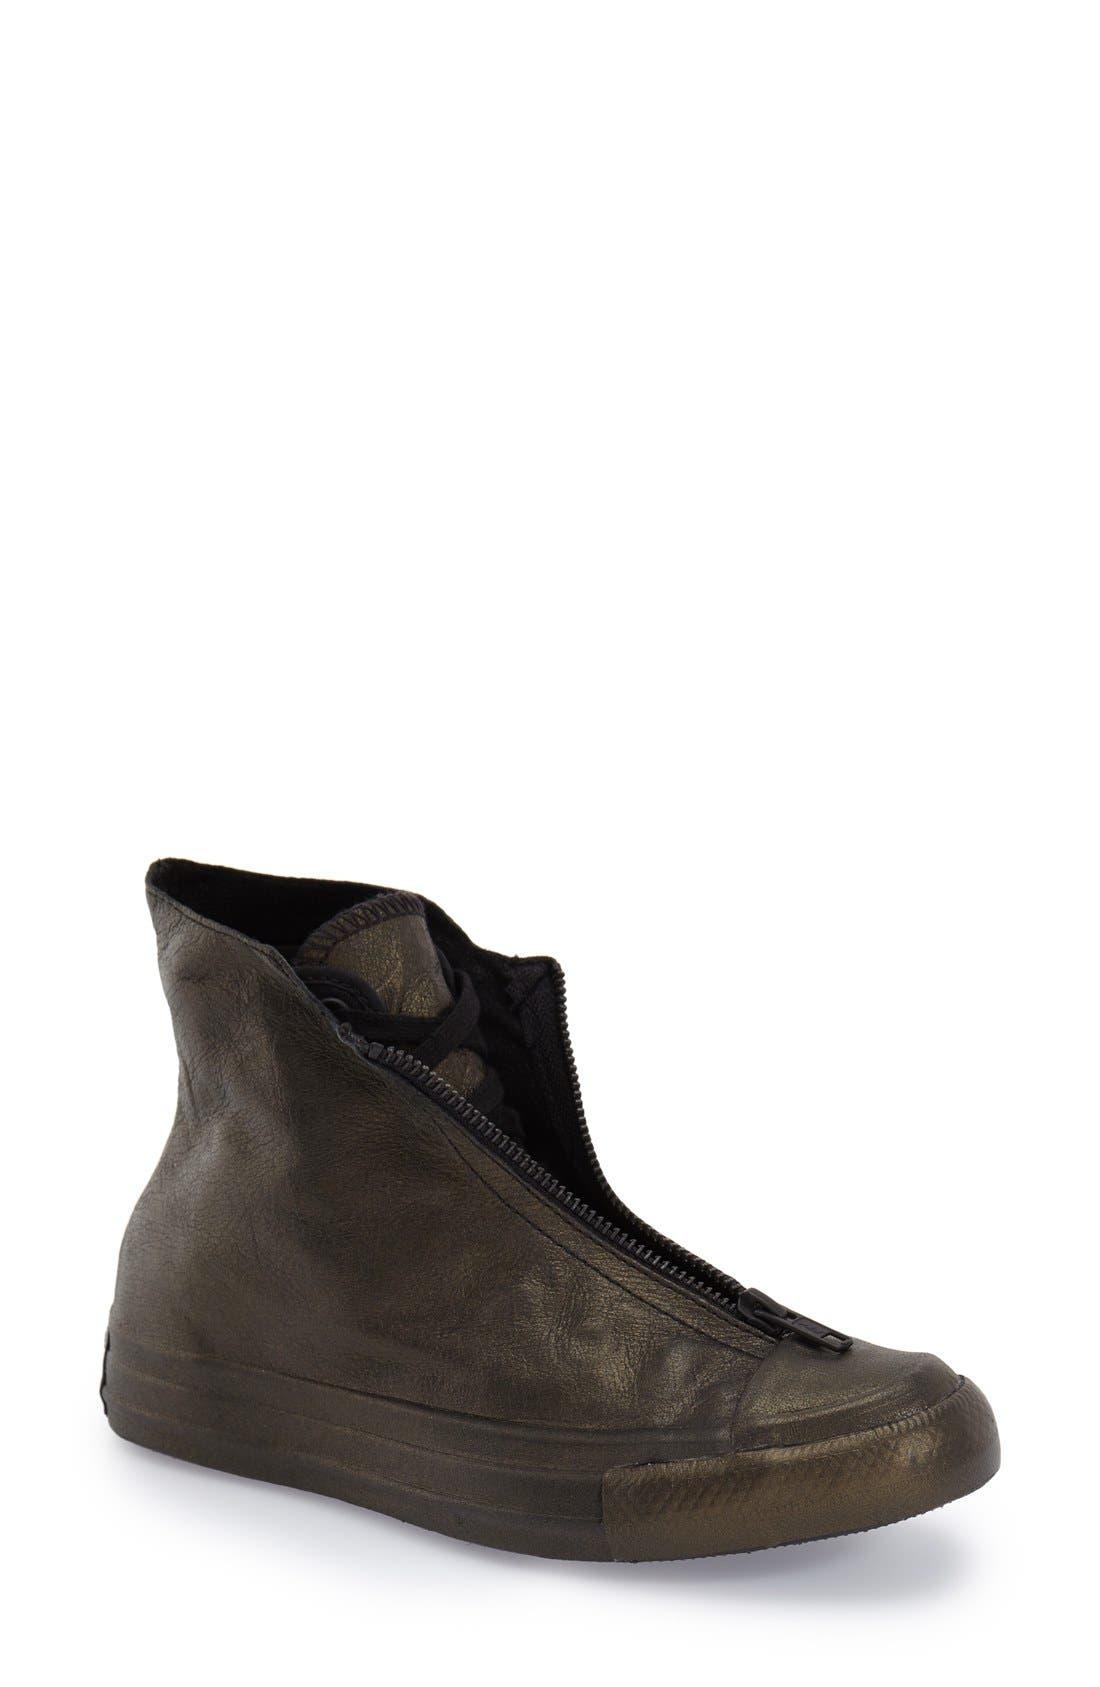 CONVERSE,                             Chuck Taylor<sup>®</sup> All Star<sup>®</sup> 'Shroud' Metallic High Top Sneaker,                             Main thumbnail 1, color,                             017